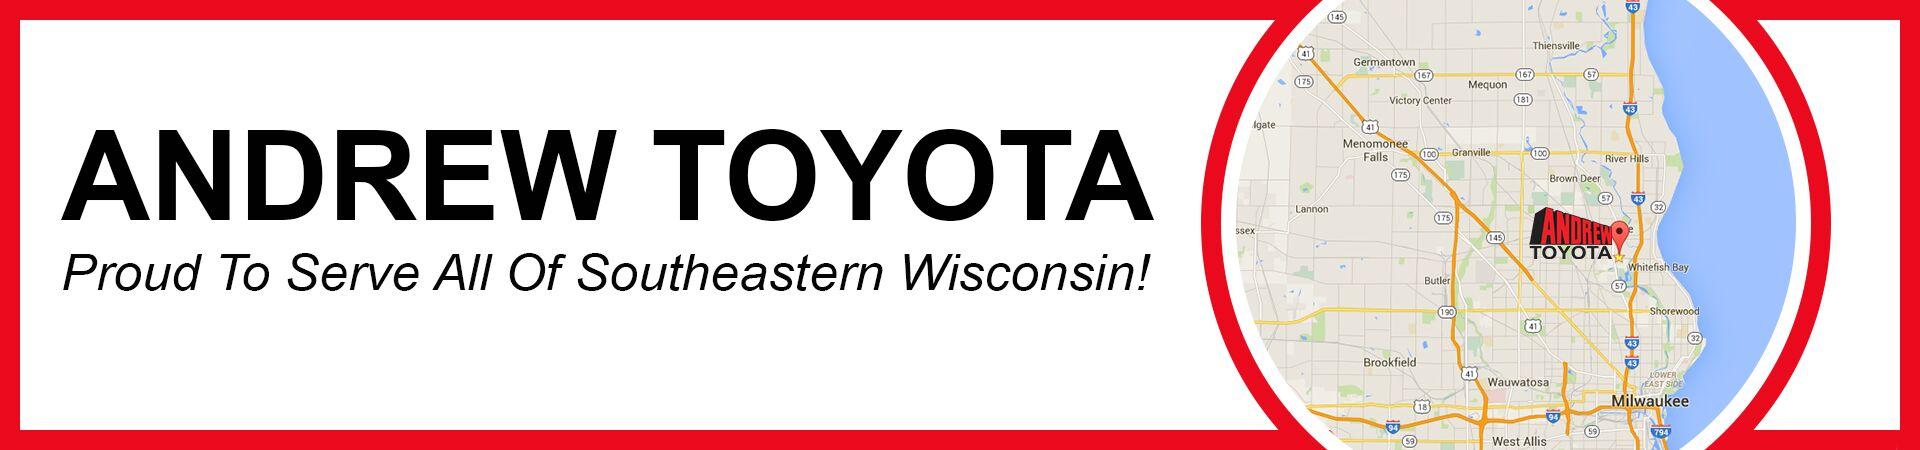 Toyota Dealer Near Me - Toyota dealers wisconsin